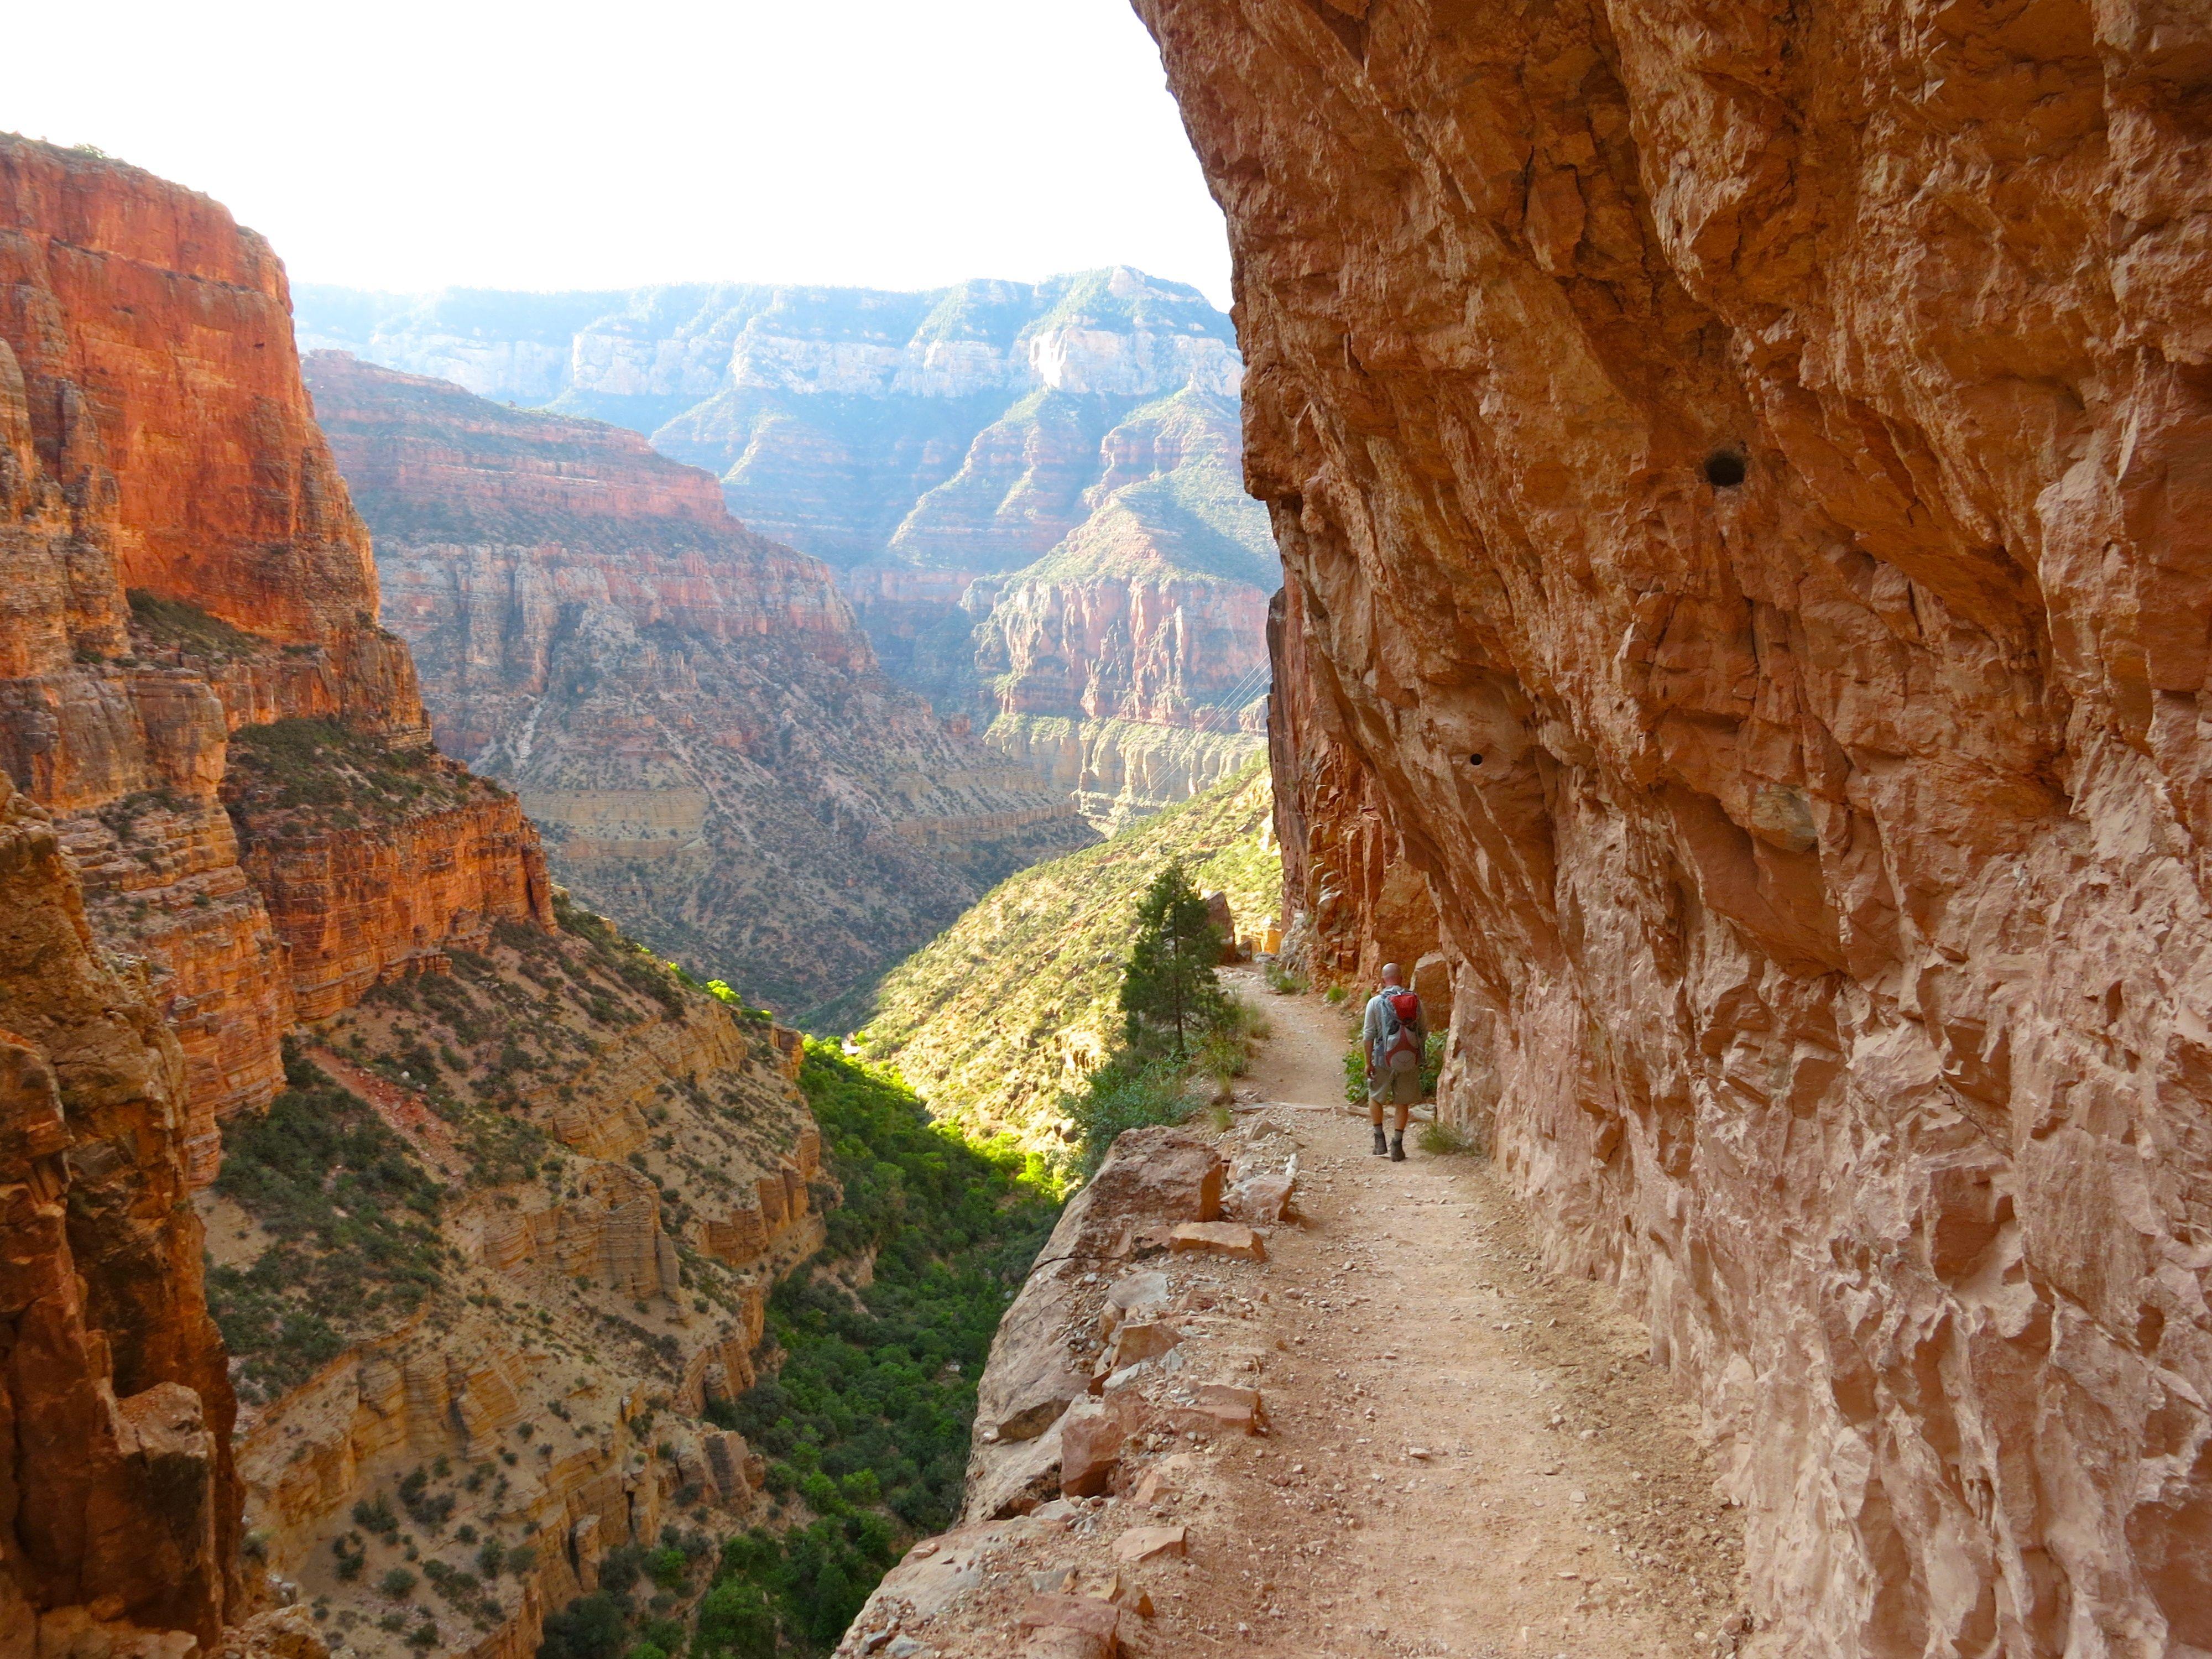 grand canyon rim to rim trail map Google Search AMERICA 3